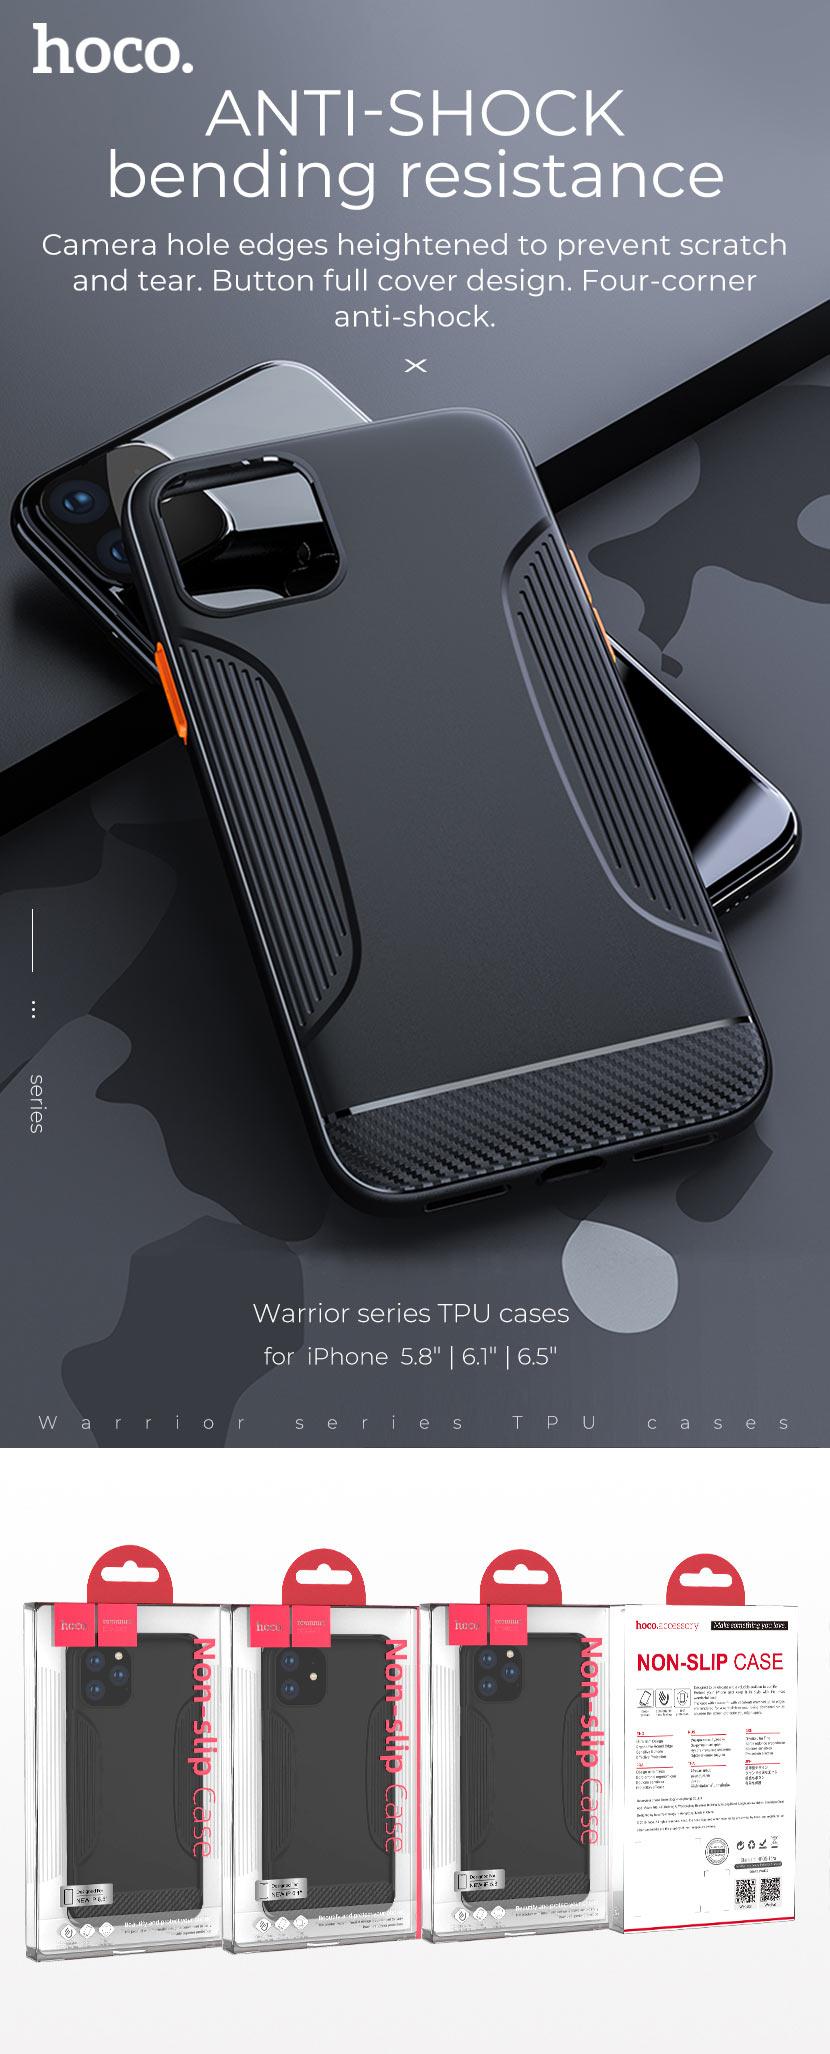 hoco news 2019 iphone case collection warrior series en